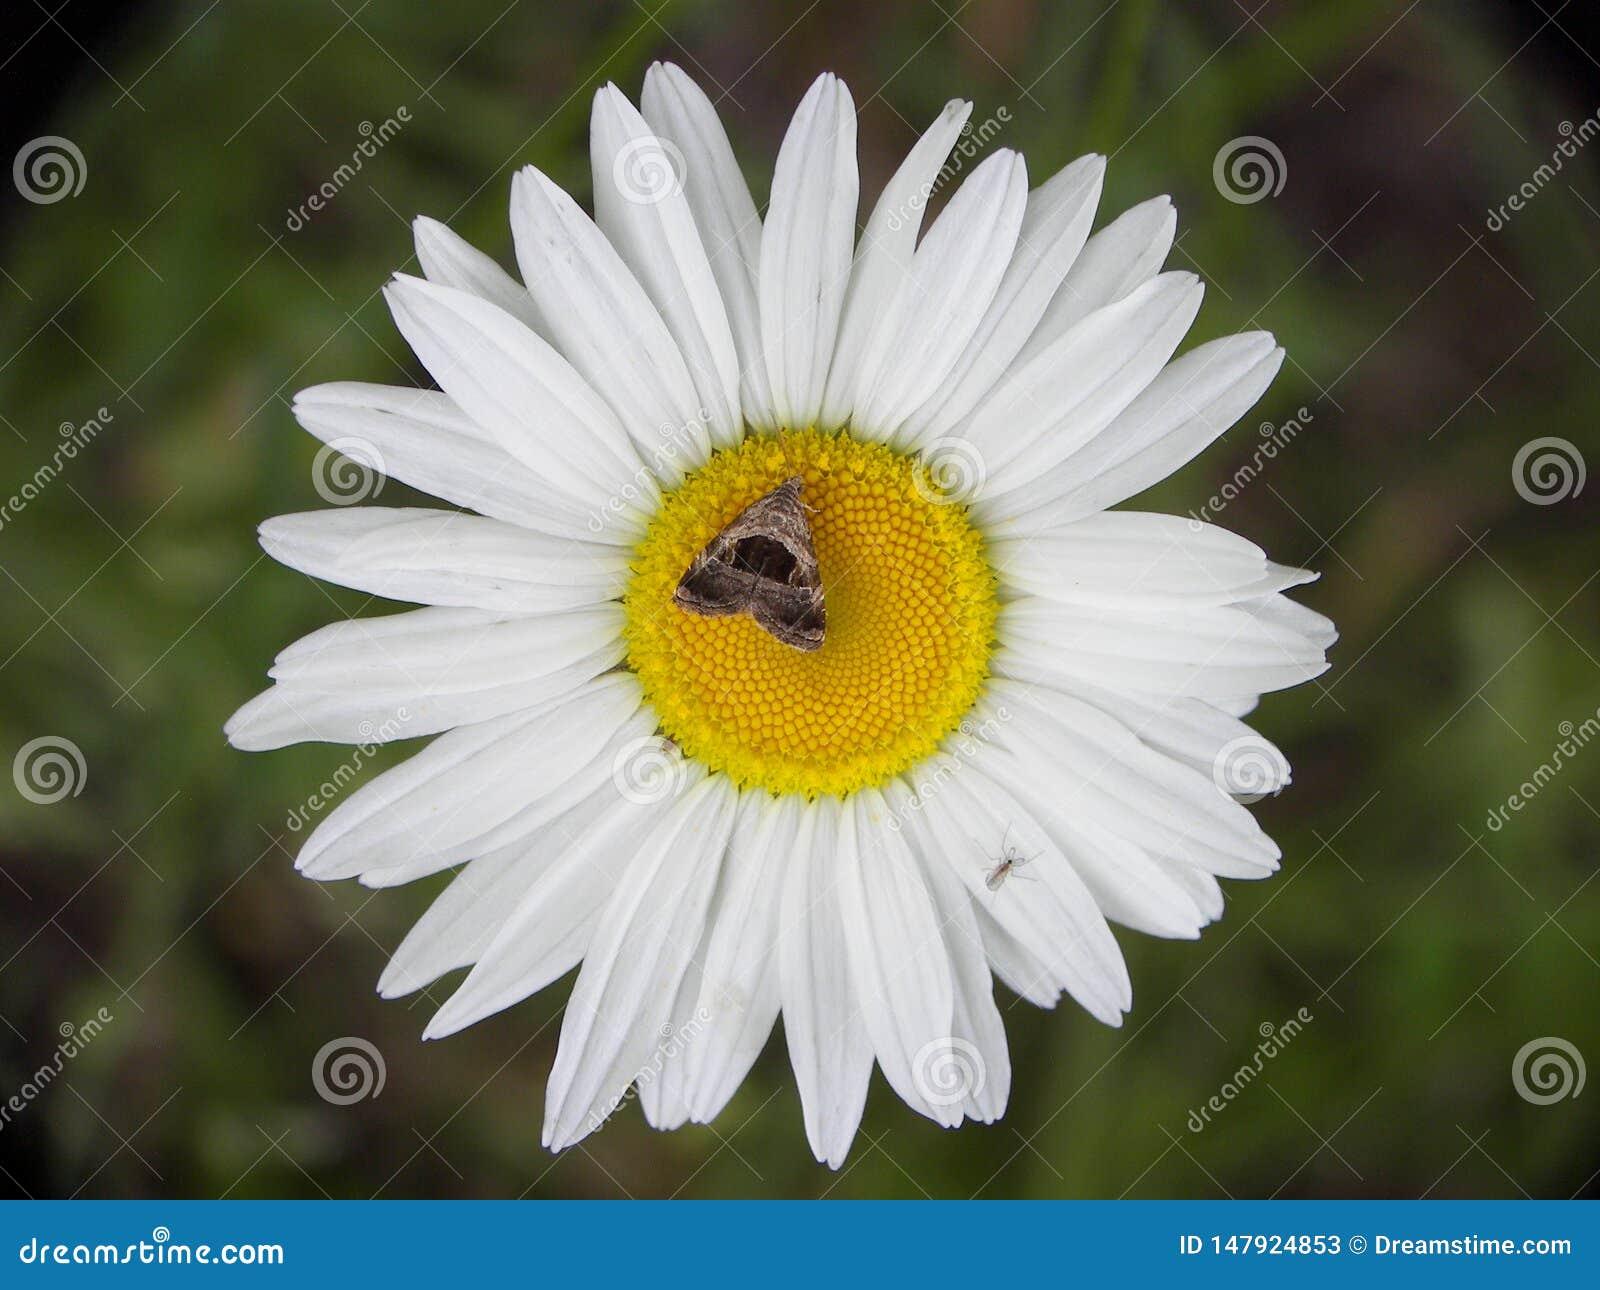 Daisy flower with moth